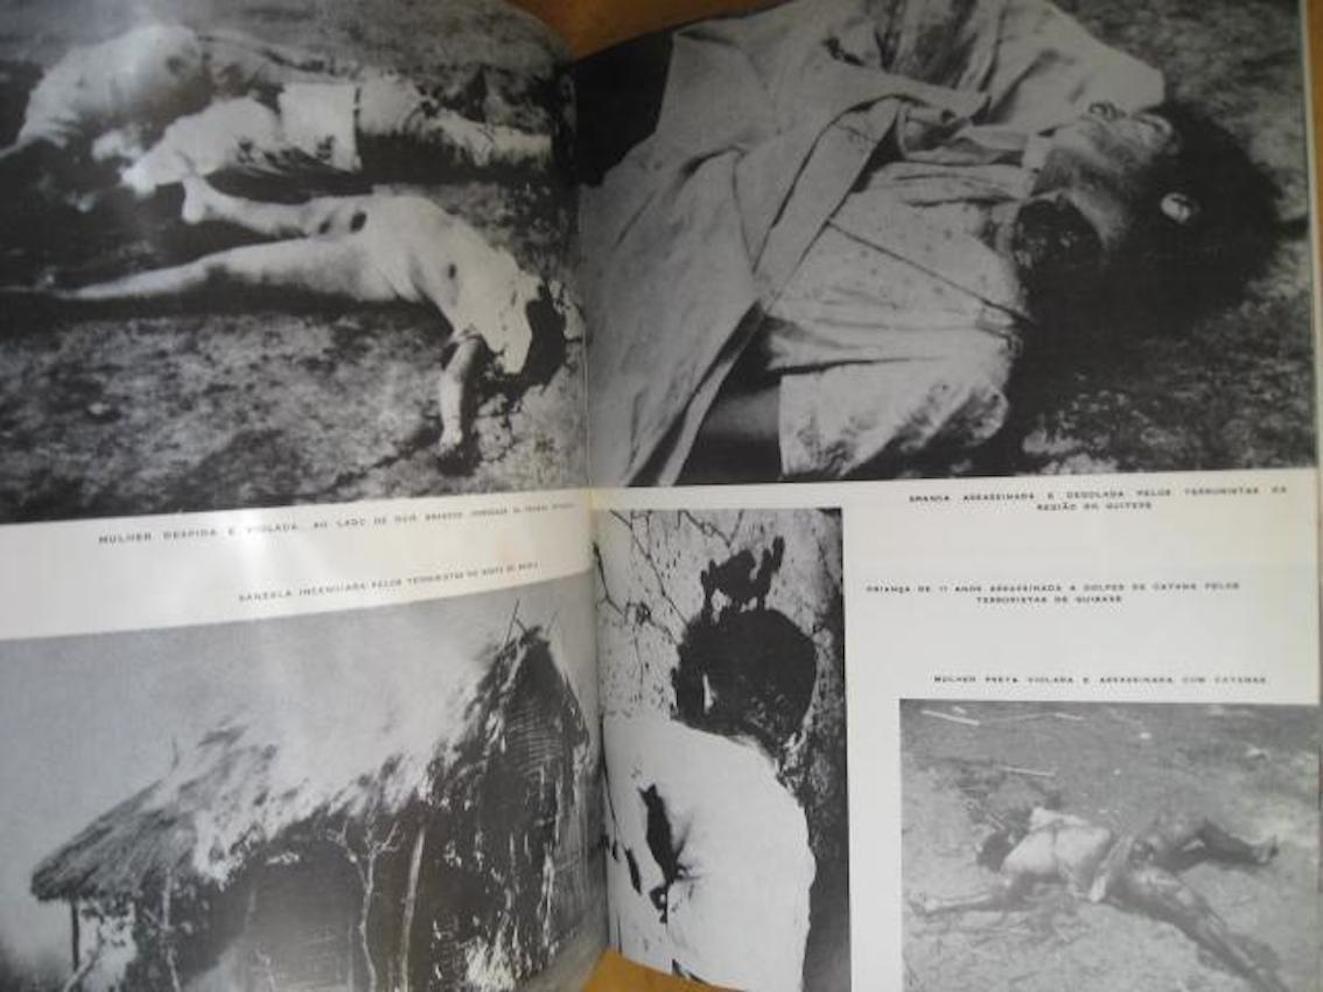 angola 1961 como os independentistas prepararam a guerra